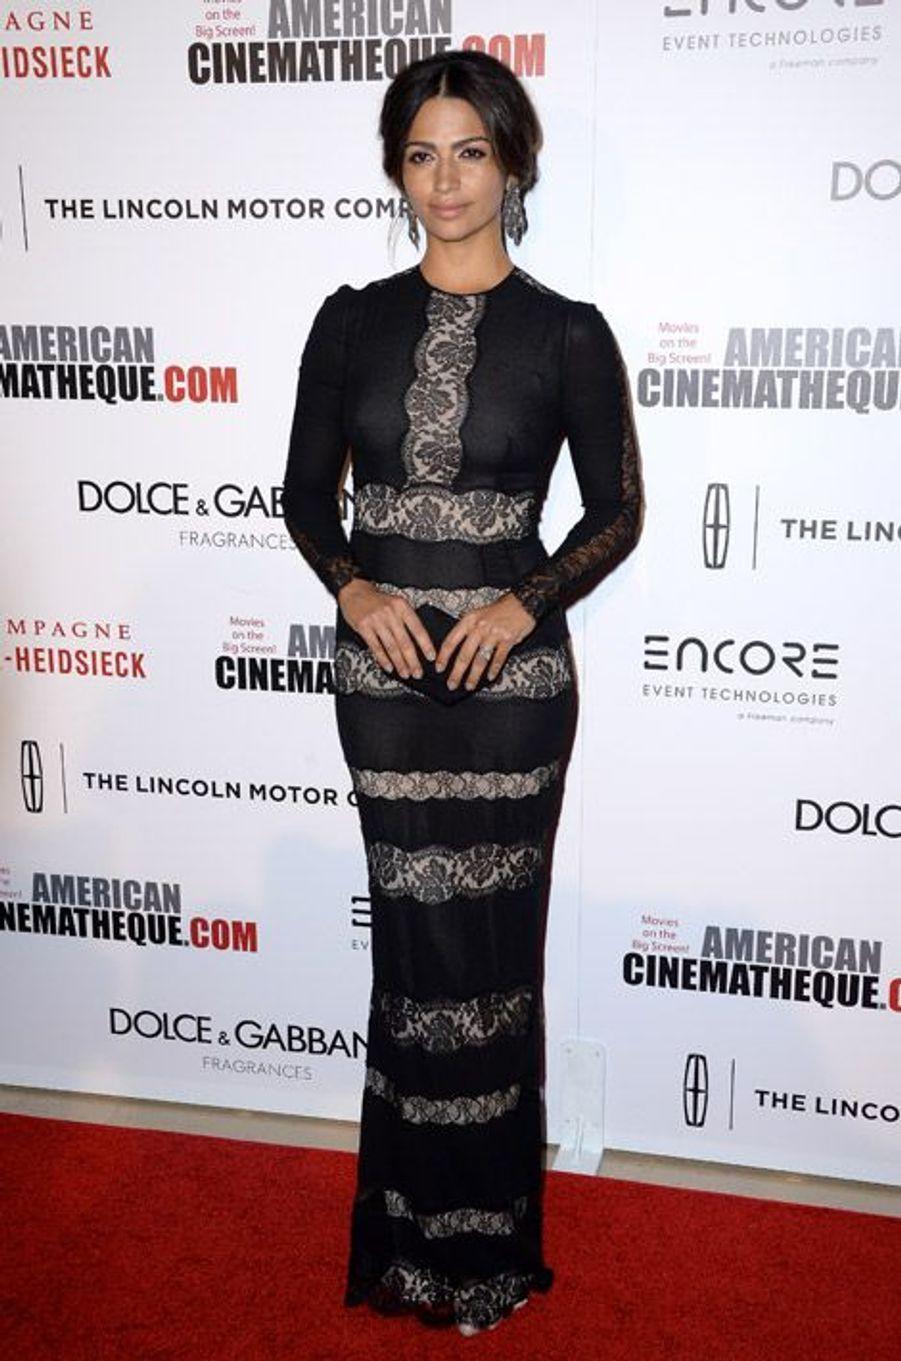 Camila Alves, 32 ans, dans une robe Dolce & Gabbana lors des American Cinematheque Award en l'honneur de son mari, Matthew McConaughey